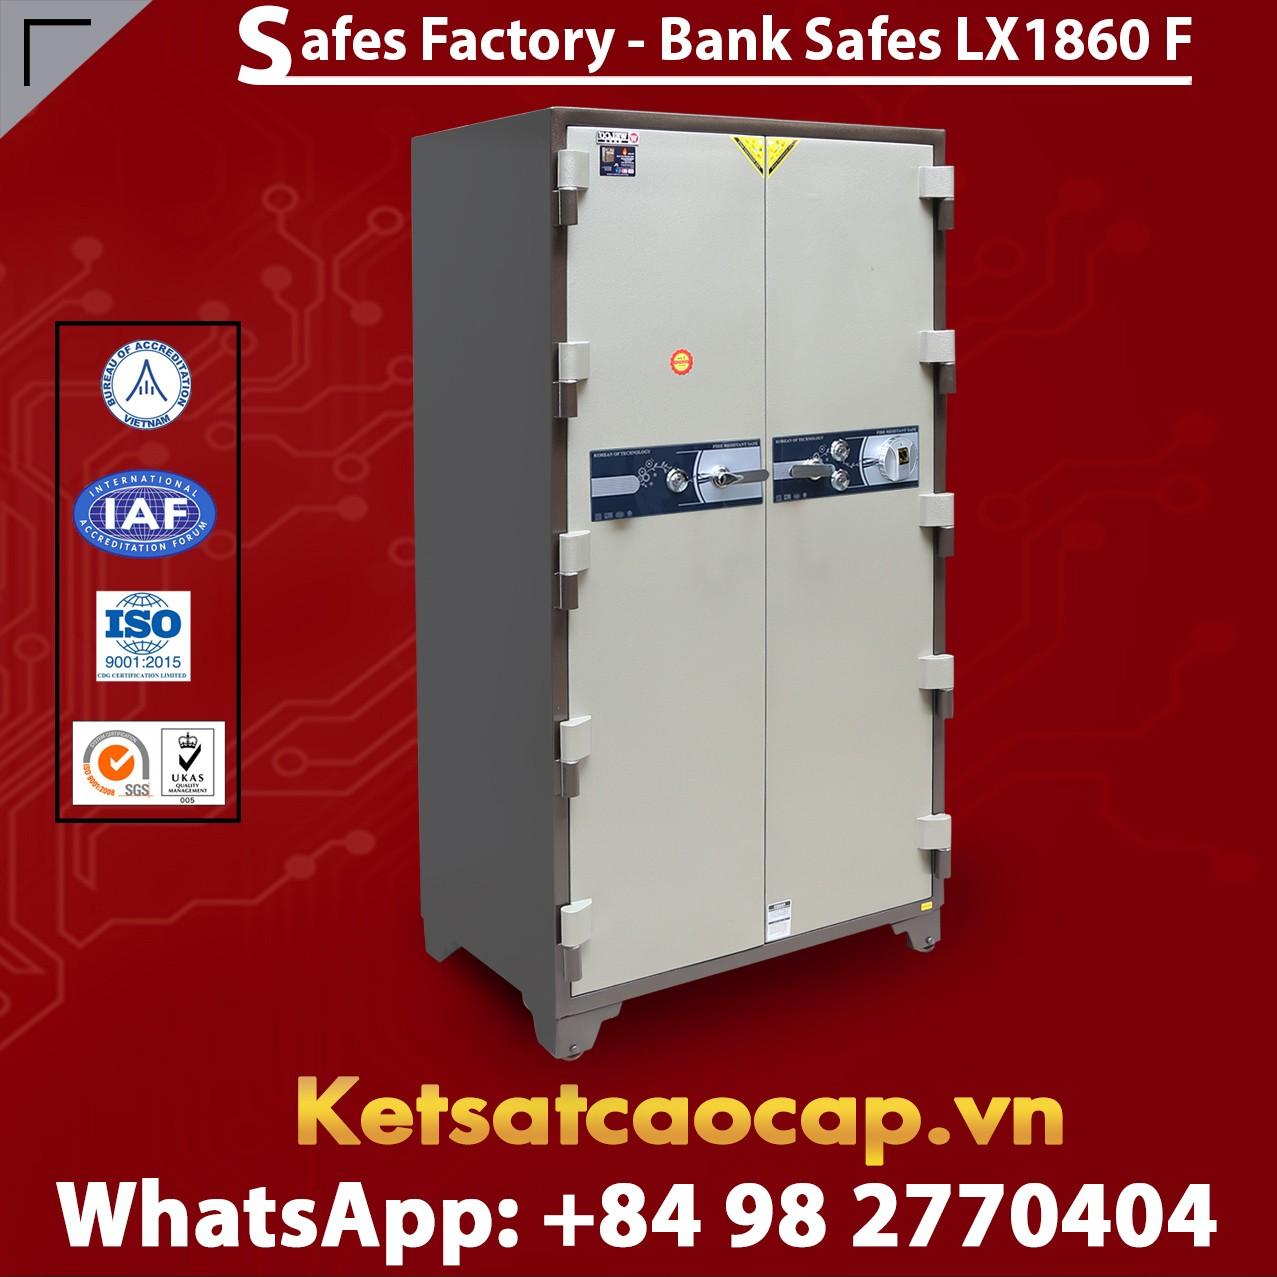 Bank Safes LX 1860 F Two Door Fingerprint Locking Customized Models